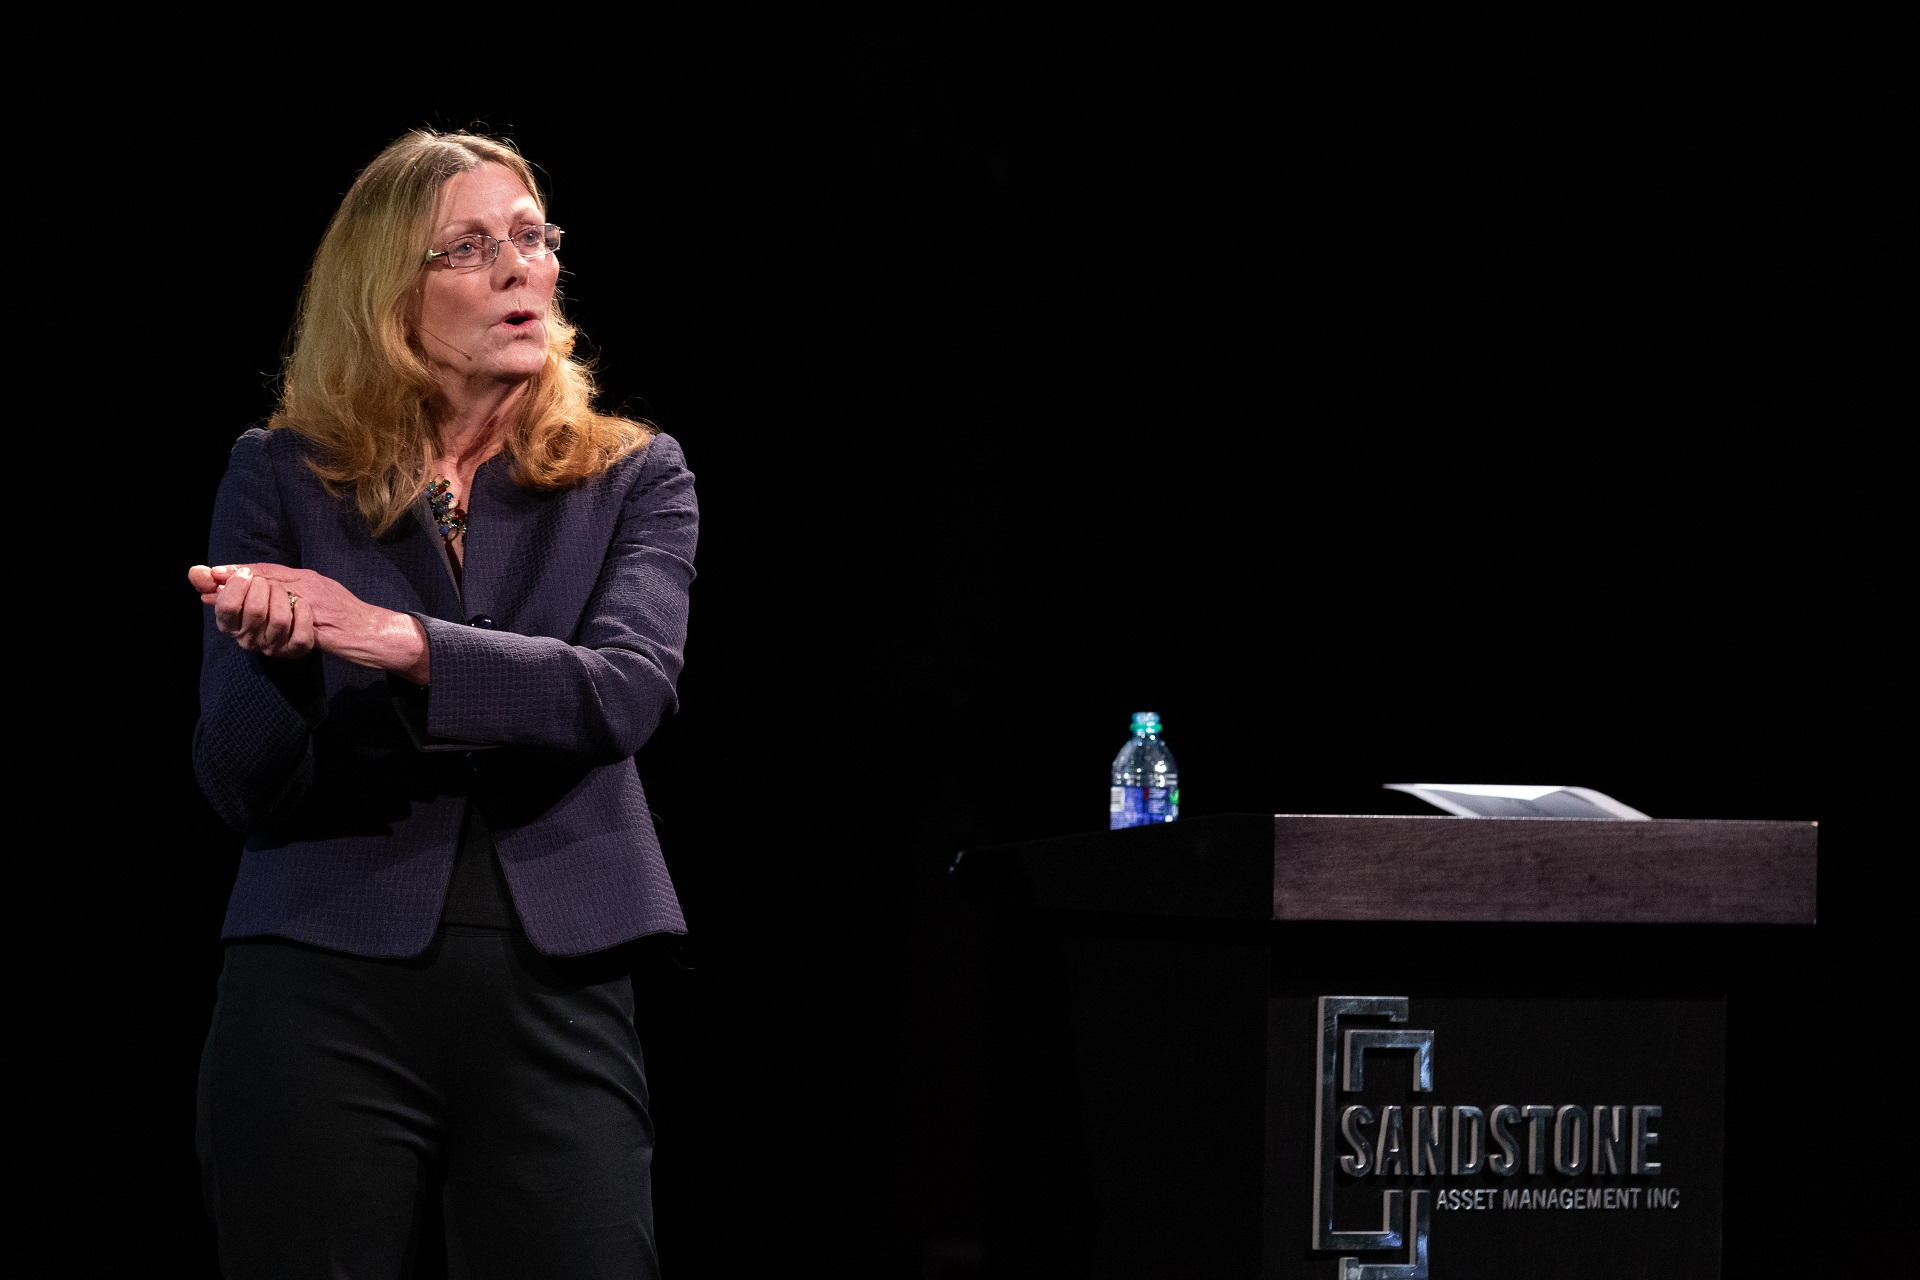 Sharon Watkins speaking on stage at OUTLOOK 2019